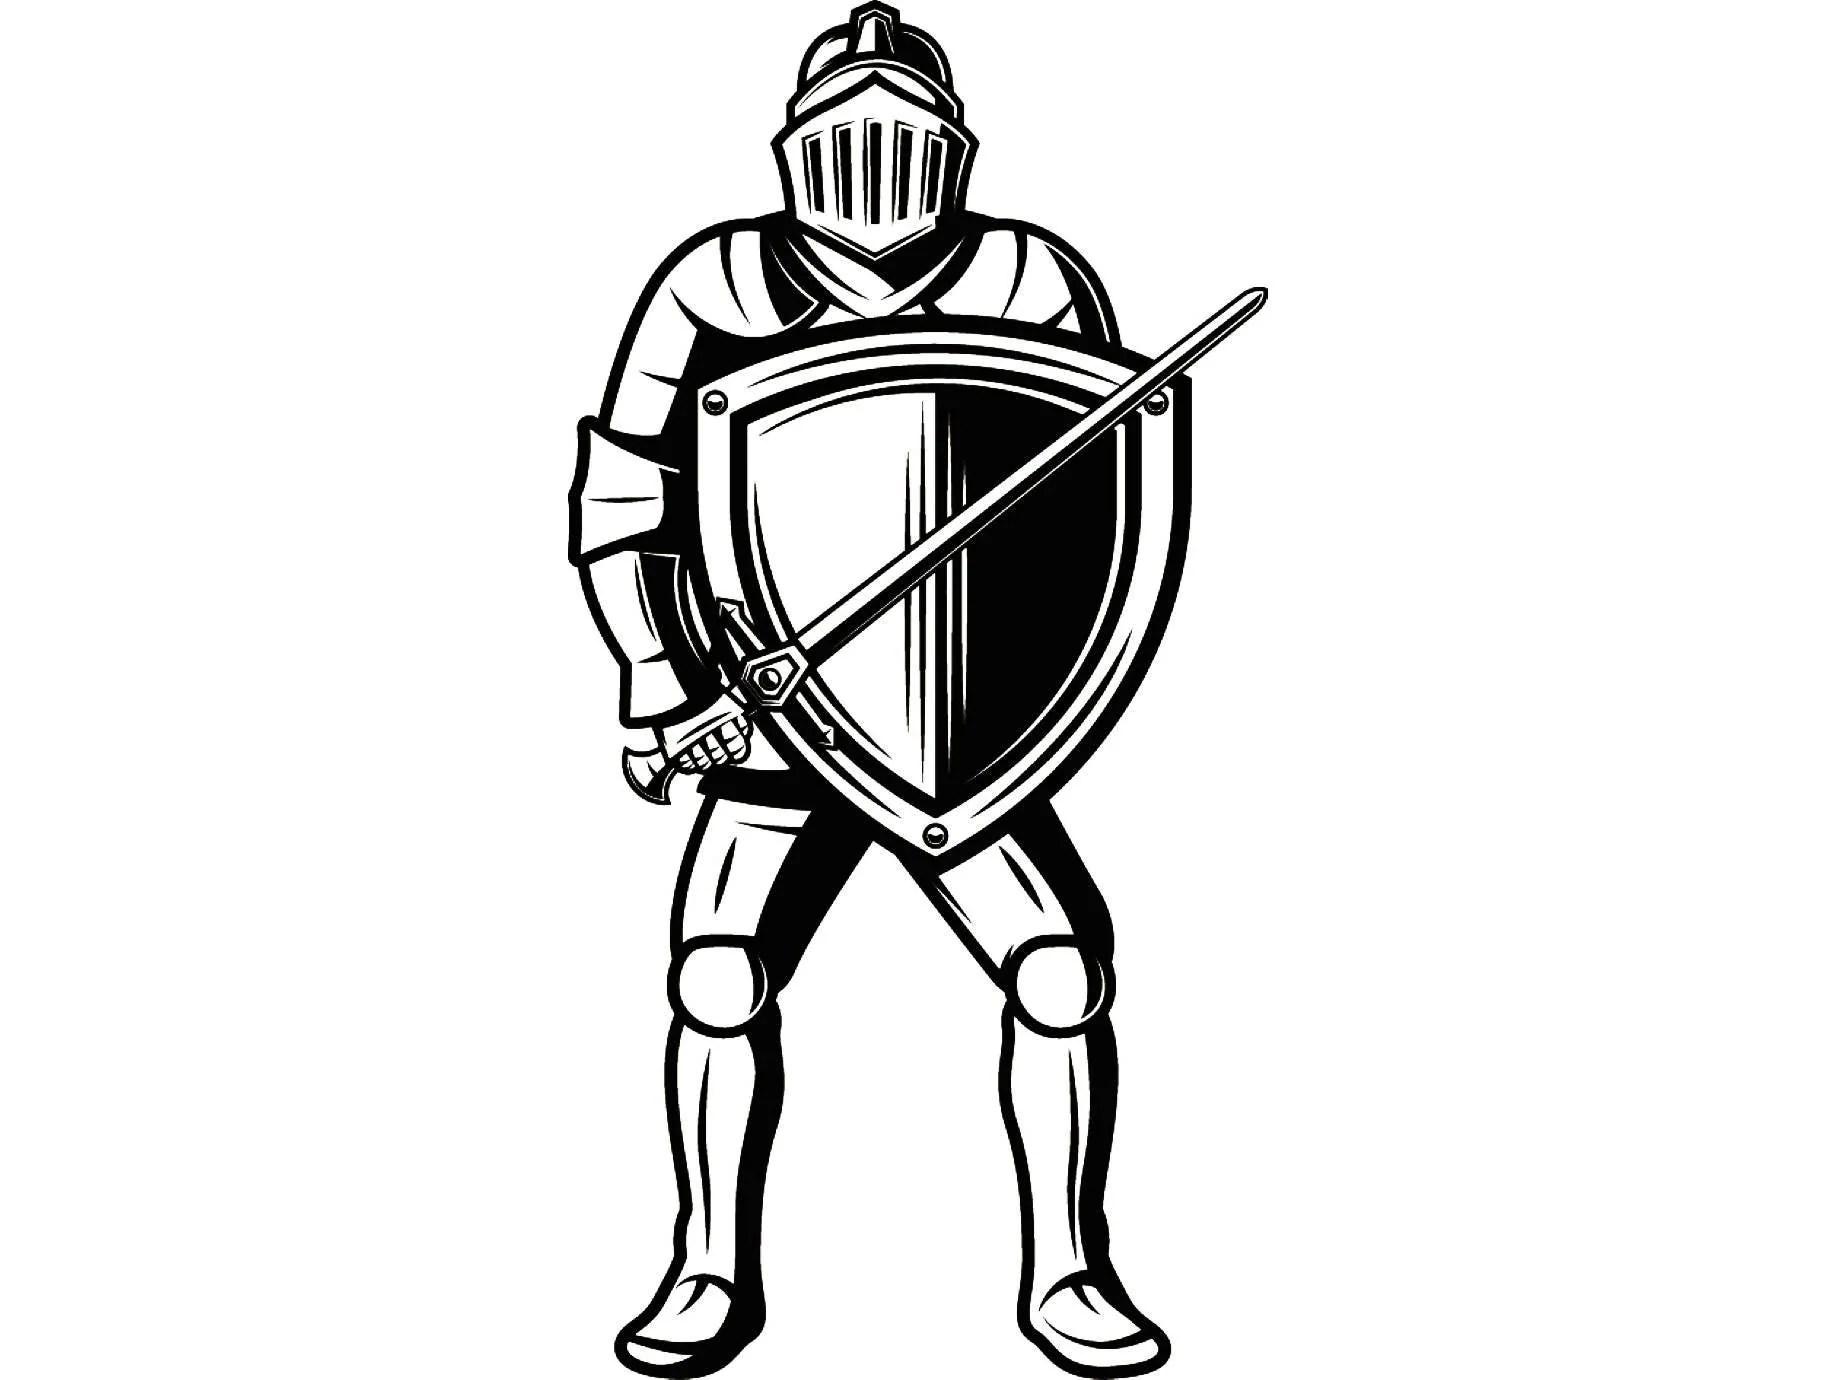 Caballero armadura metálica 1 casco espada escudo monarca